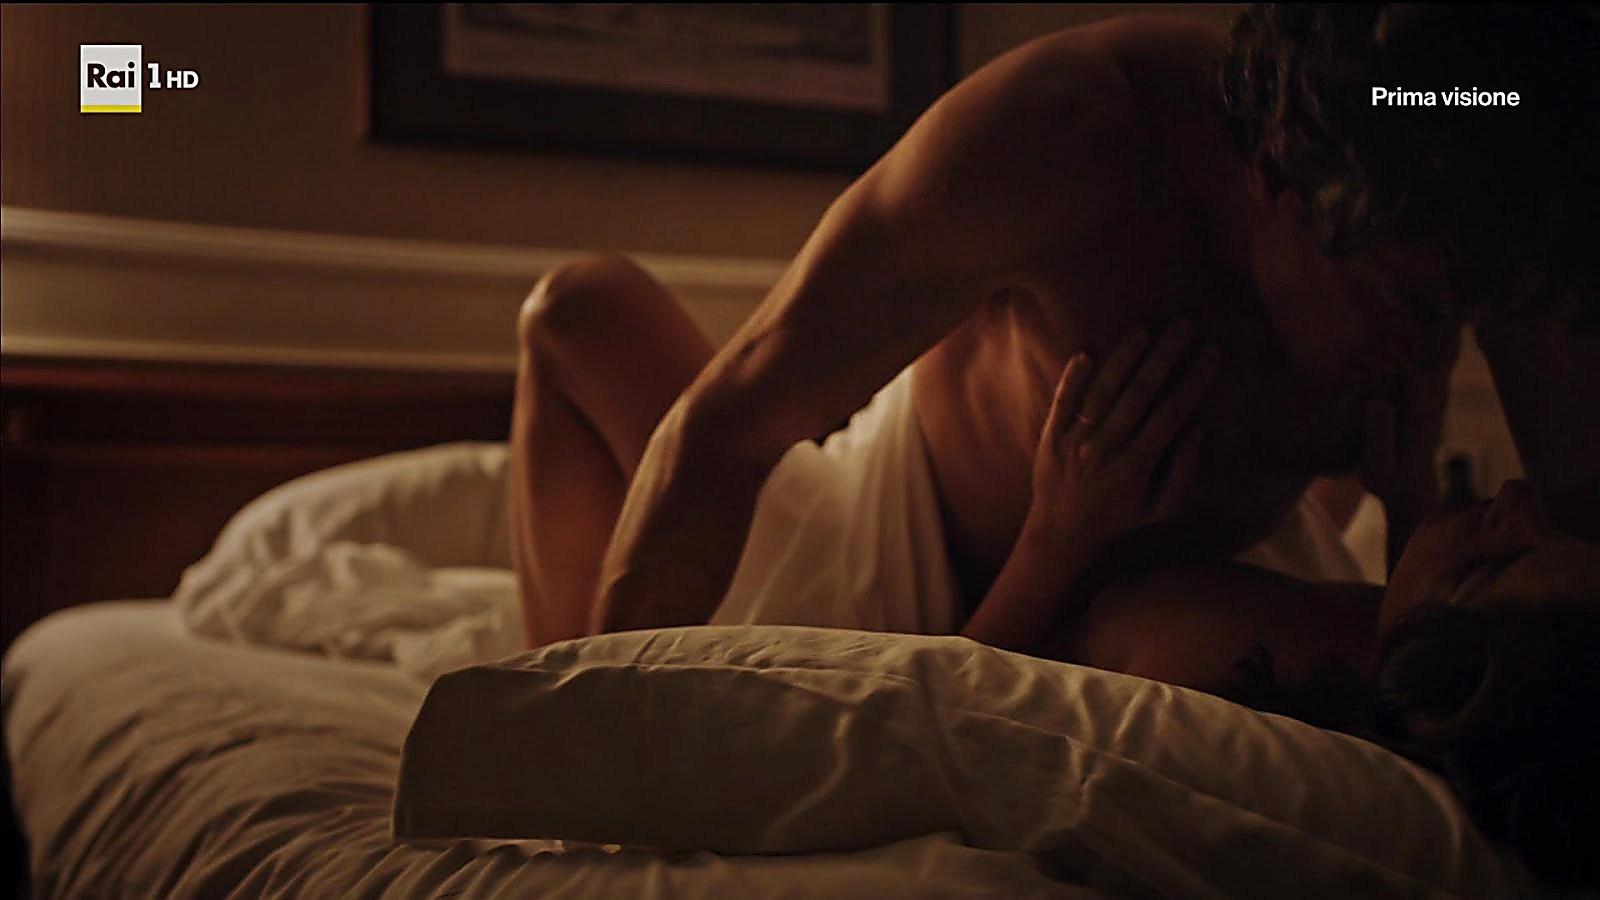 Alessio Boni sexy shirtless scene January 10, 2019, 12pm